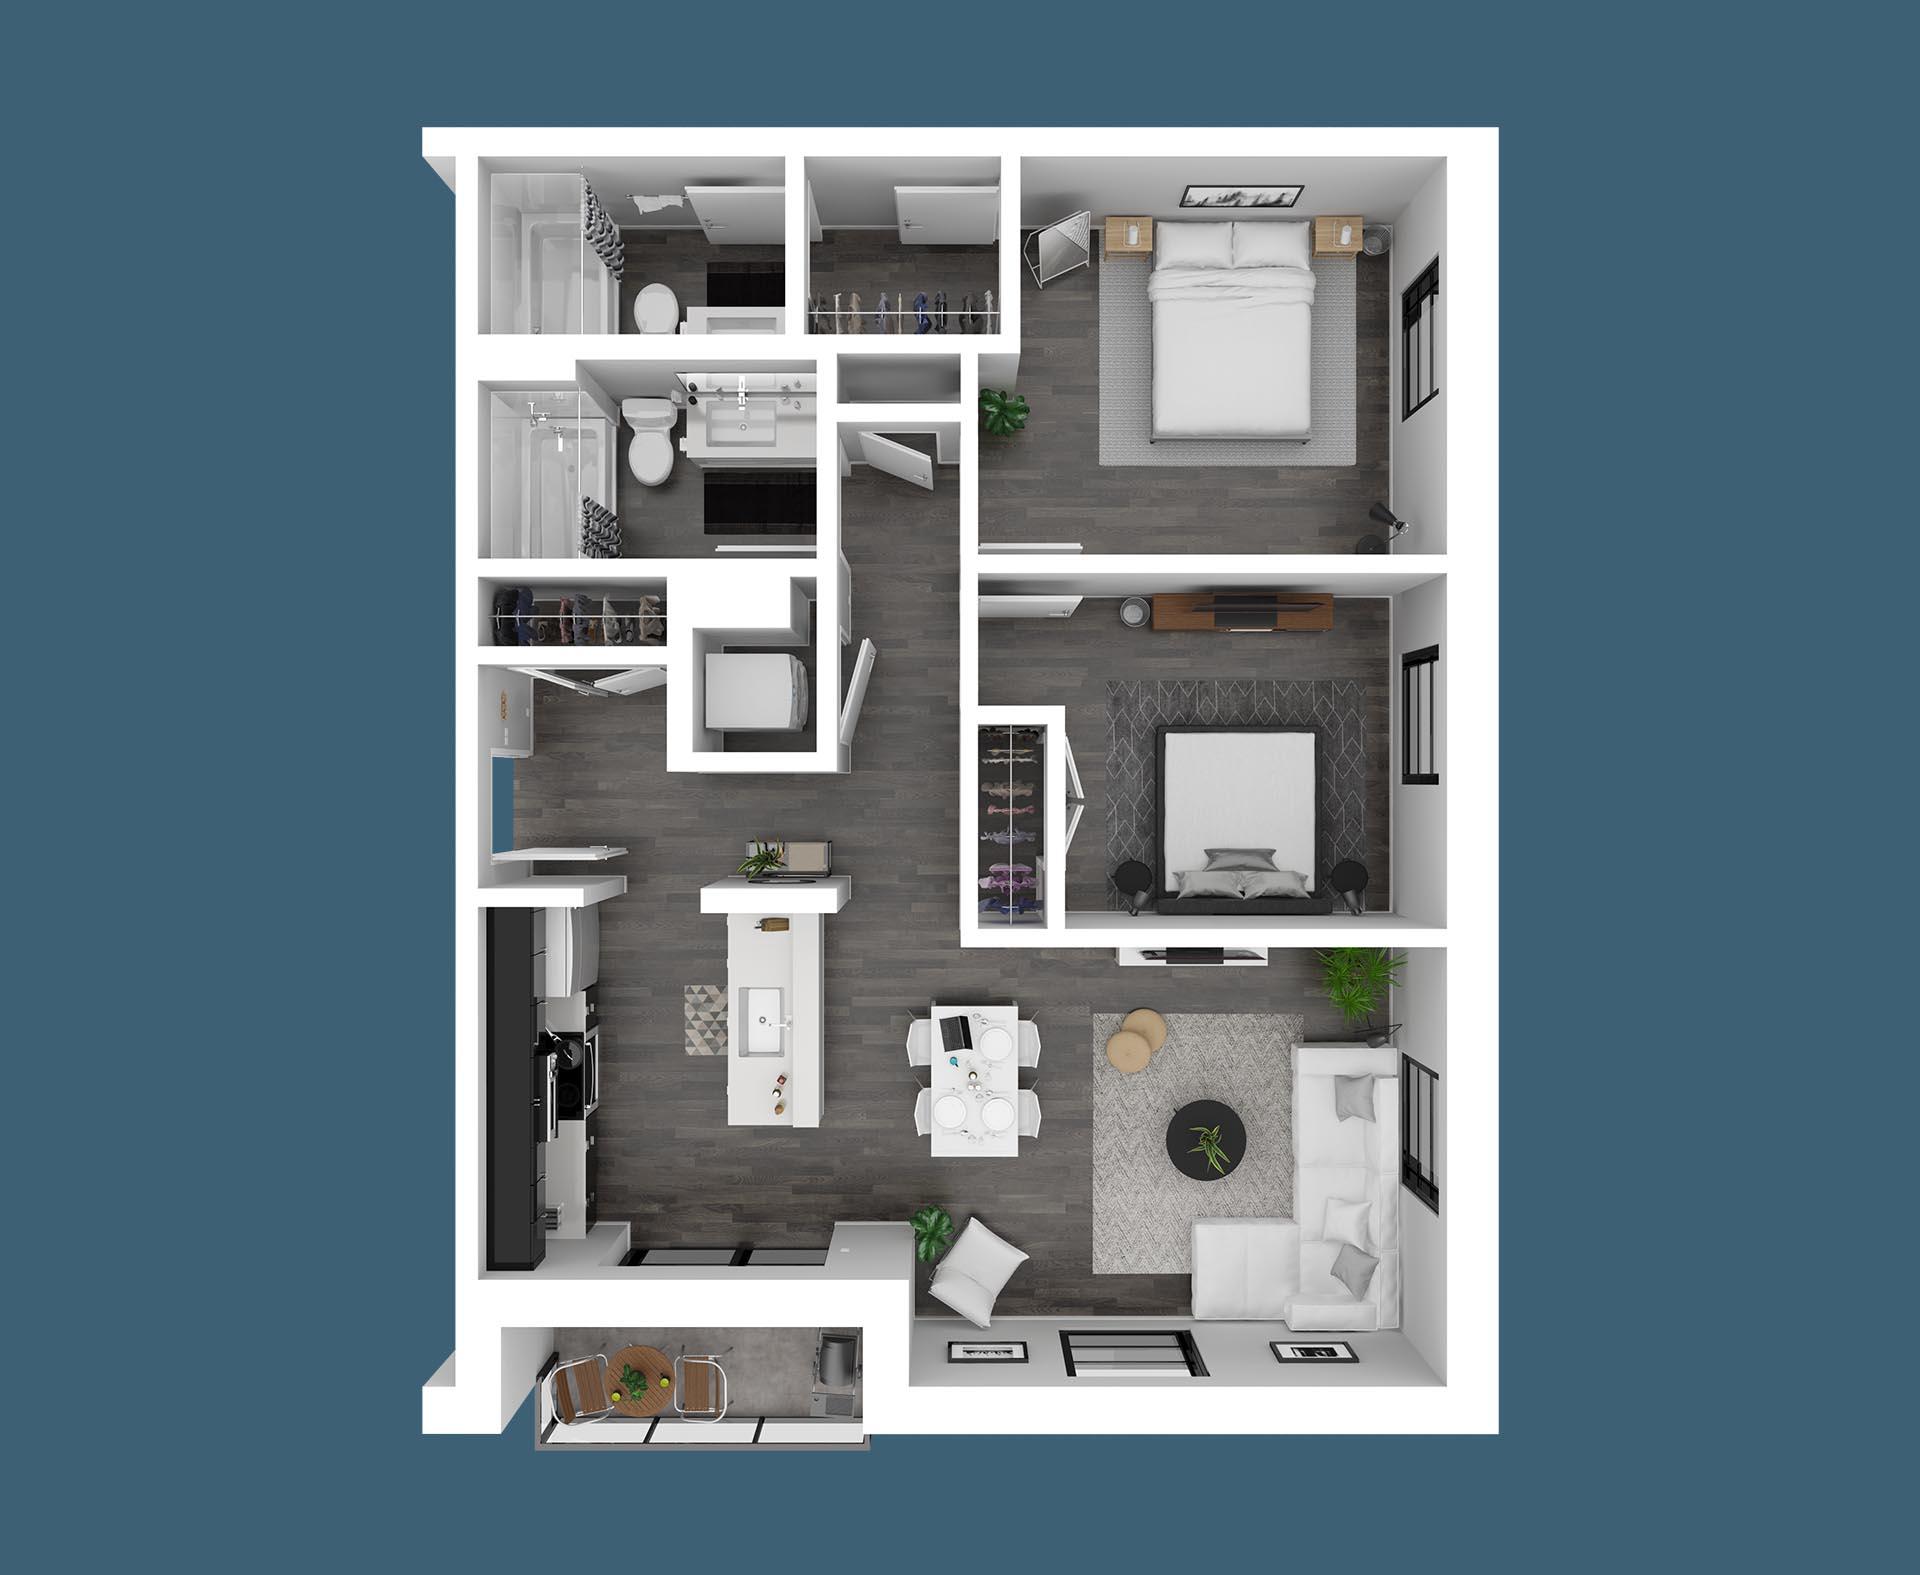 30UC Residence Four image